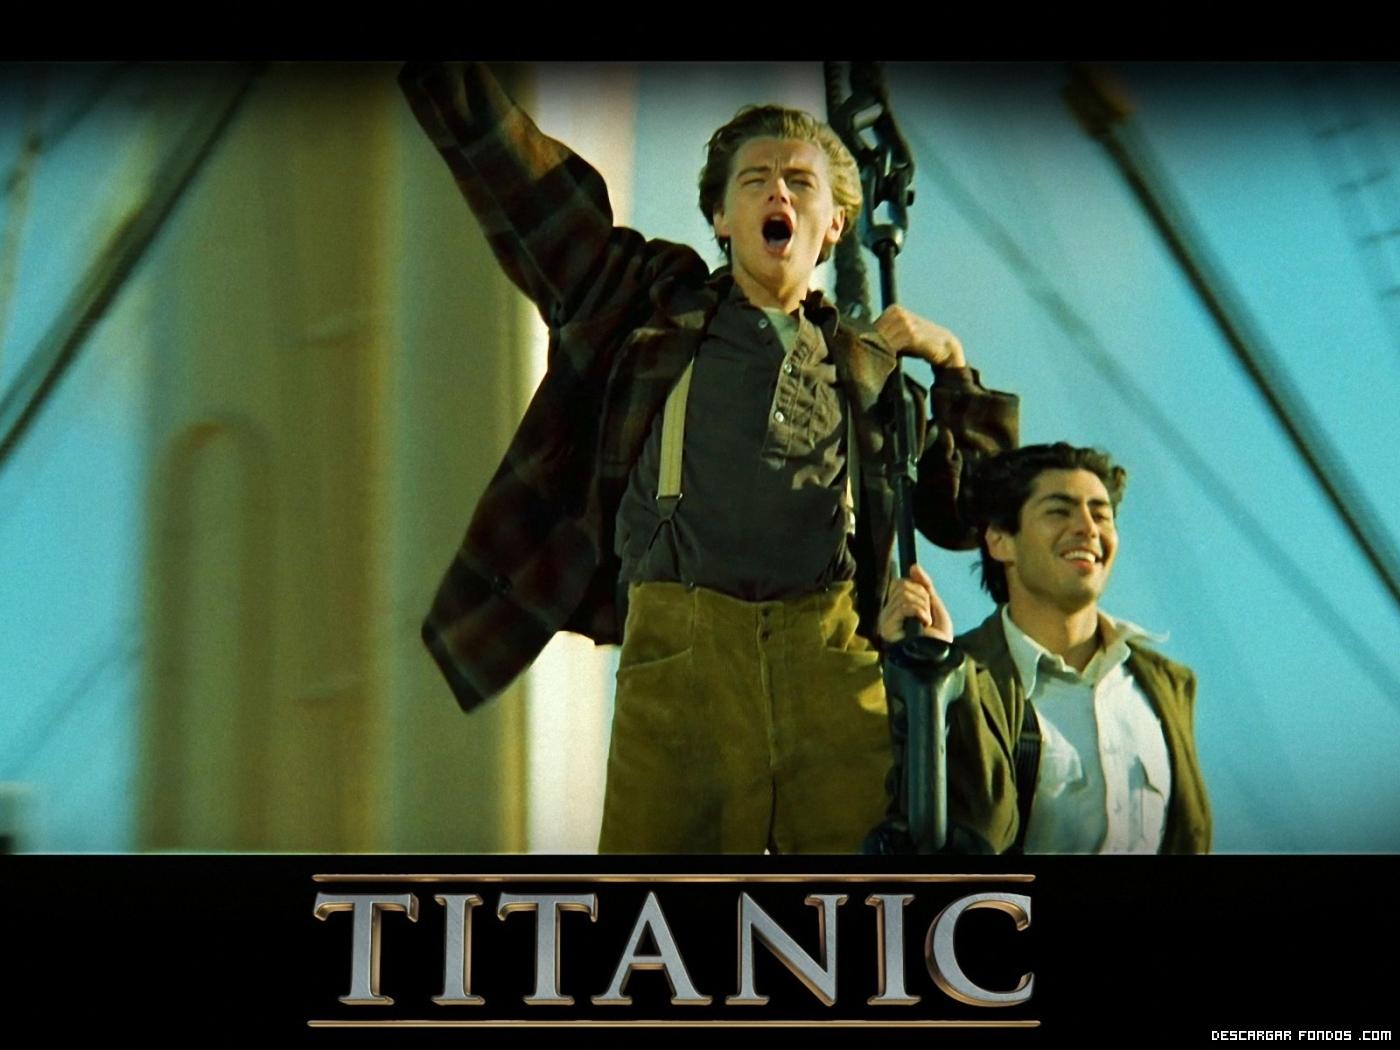 Fondo Titanic